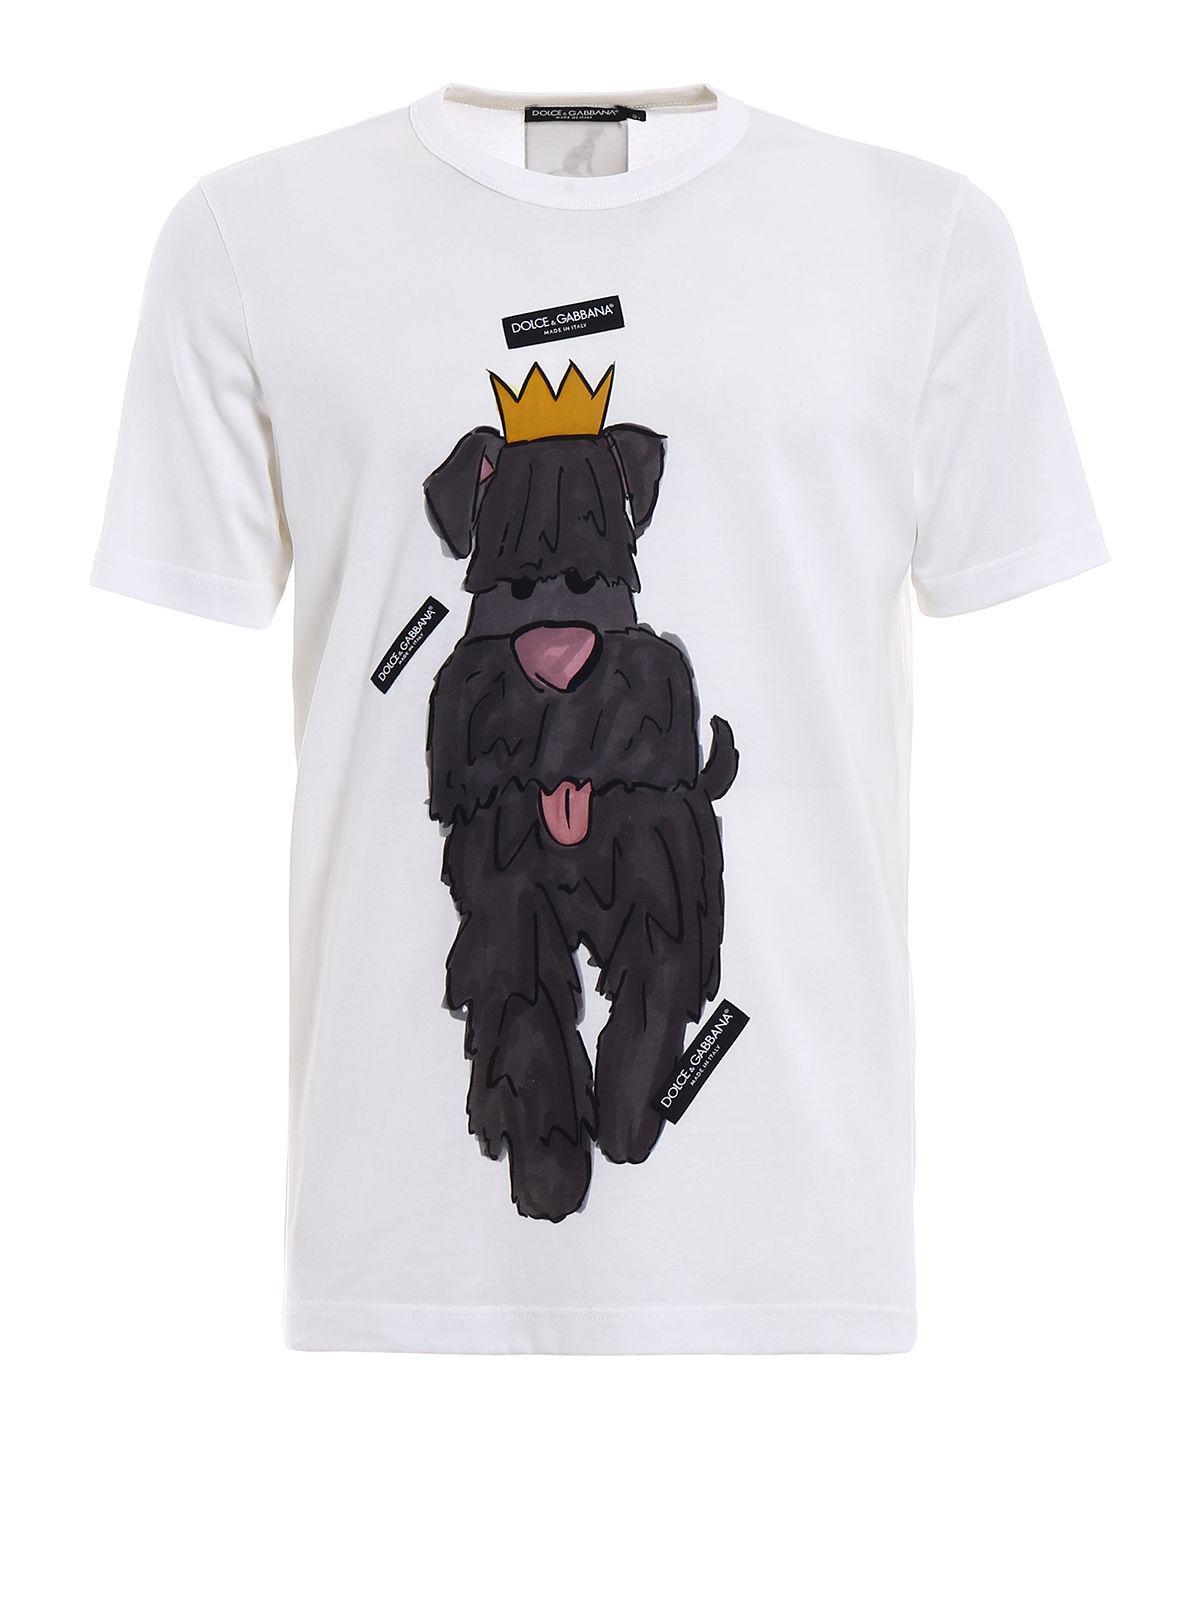 e32f7217410d0c Dolce   Gabbana T-shirt Dogs Print in White for Men - Lyst